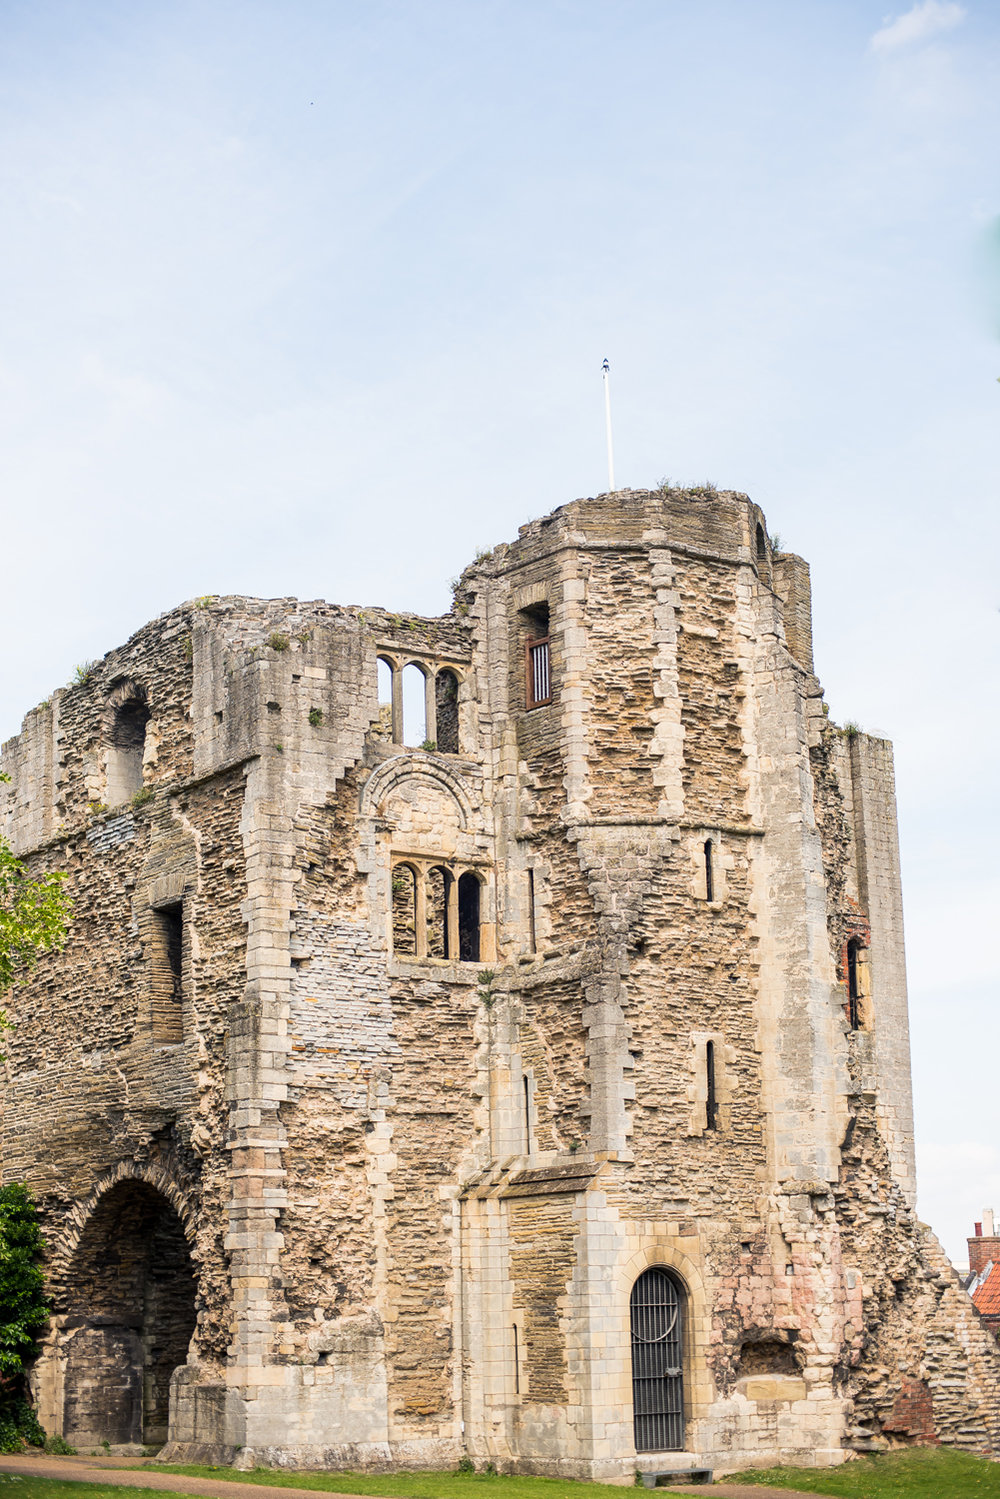 Newark castle - Summer wedding